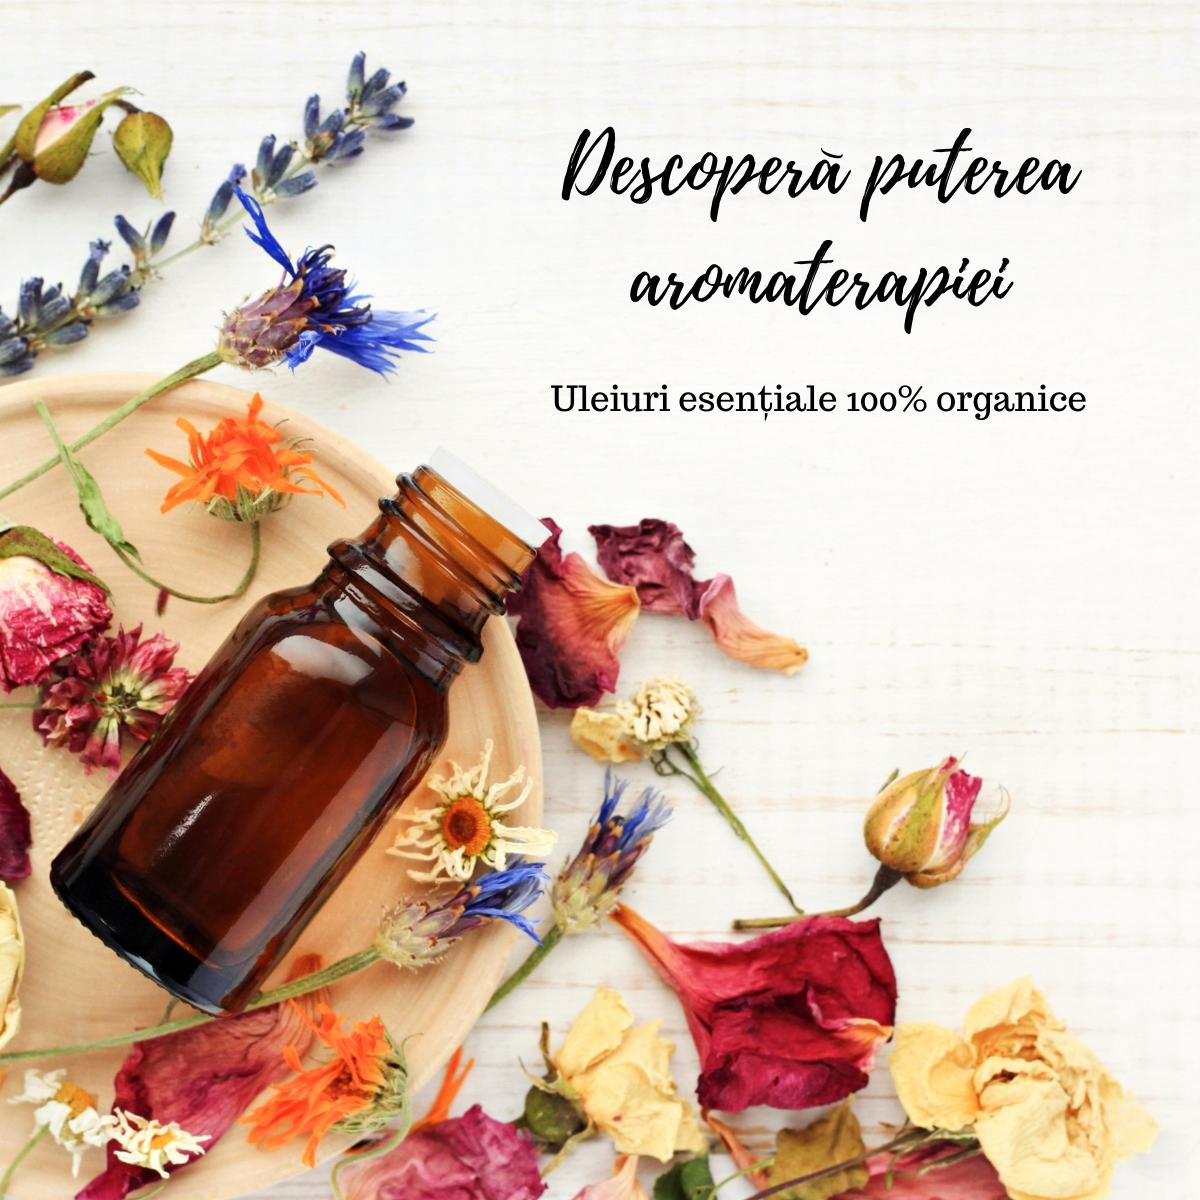 Suplimente vitamine capusle vegane Raab natural oganic